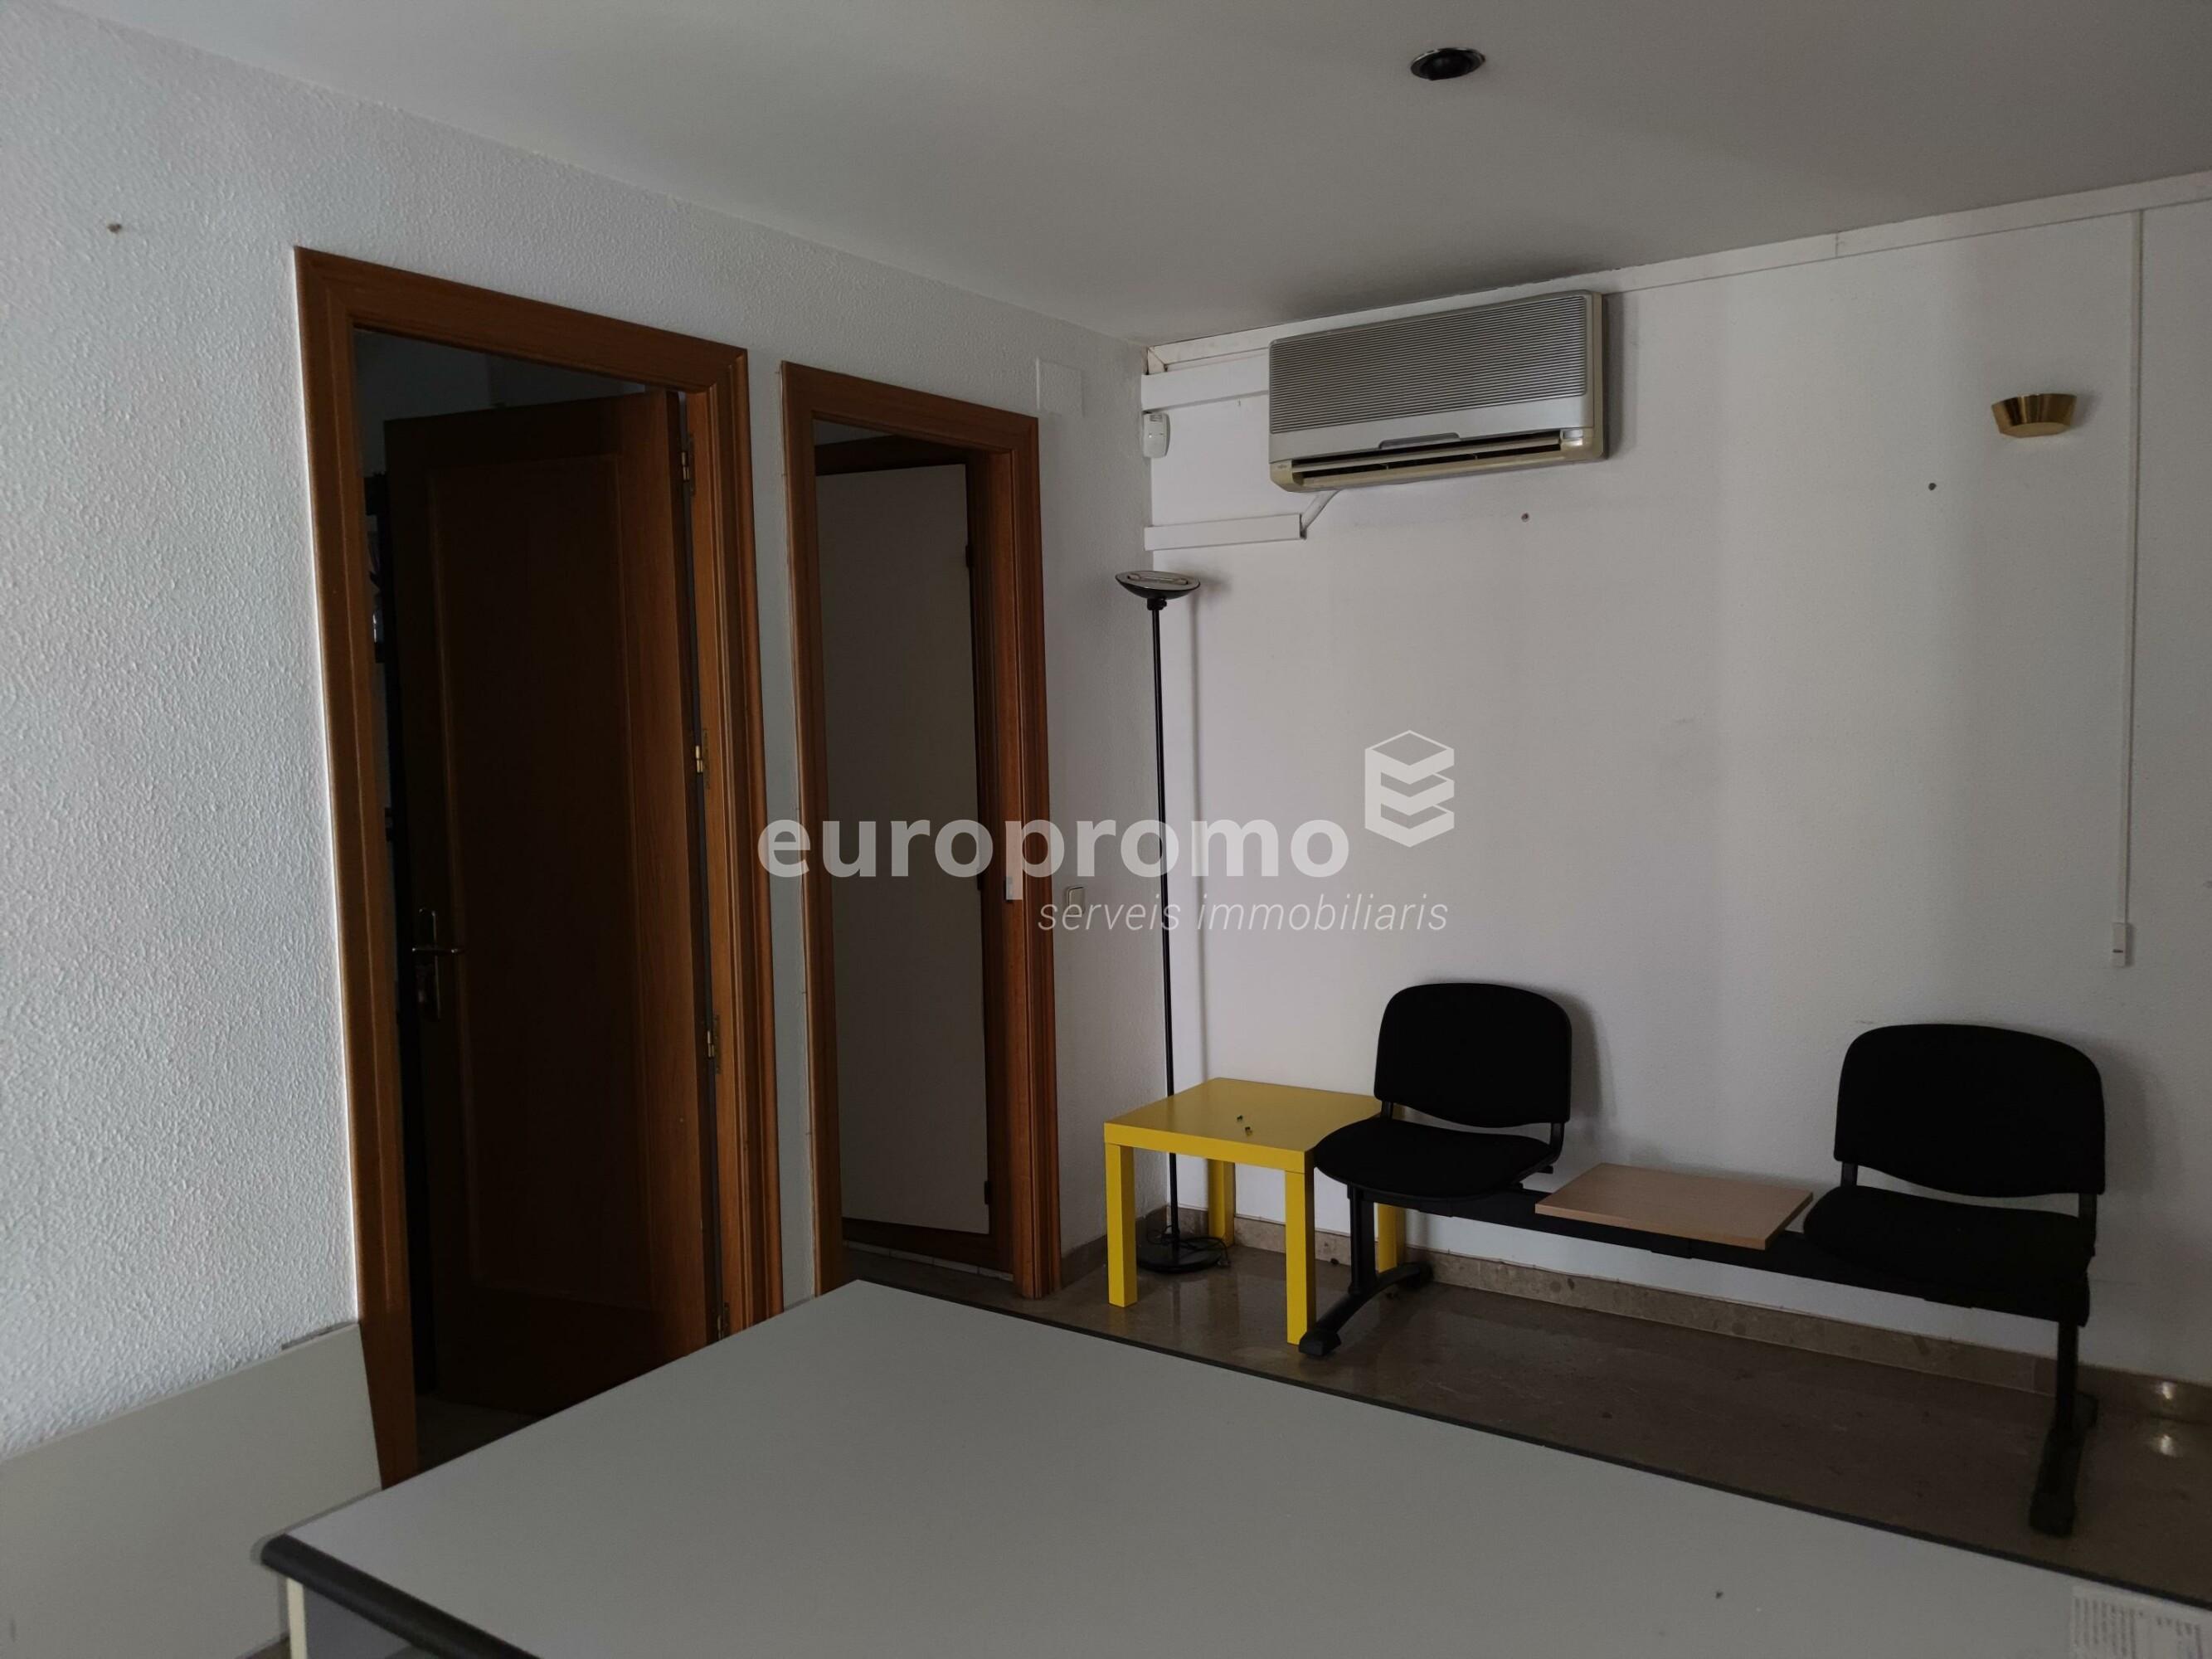 Fantàstica oficina de 55 m² al centre de Girona!